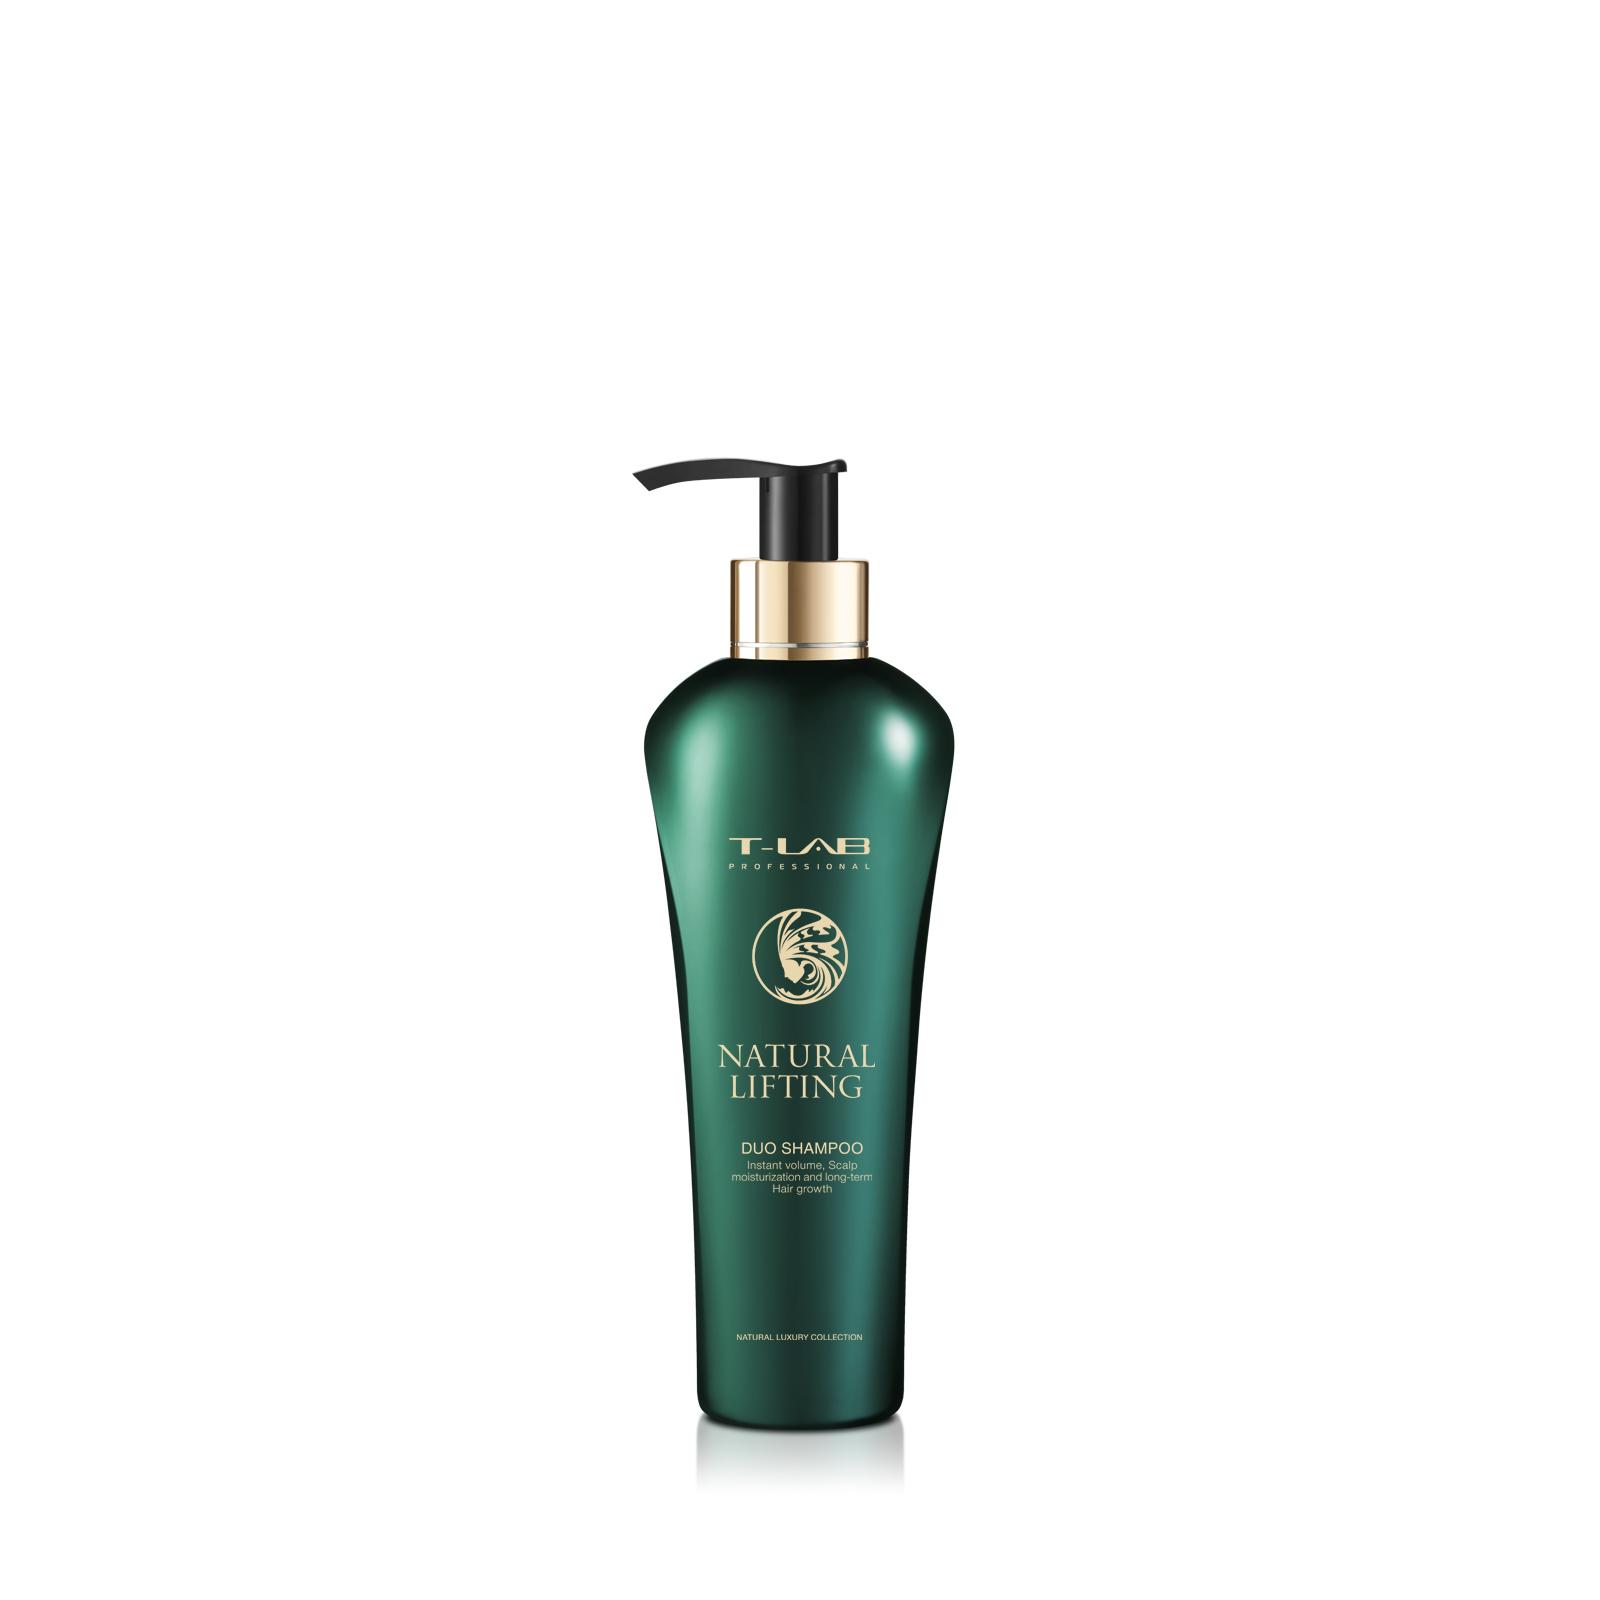 T-Lab Professional - Natural Lifting Duo Shampoo 250 ml